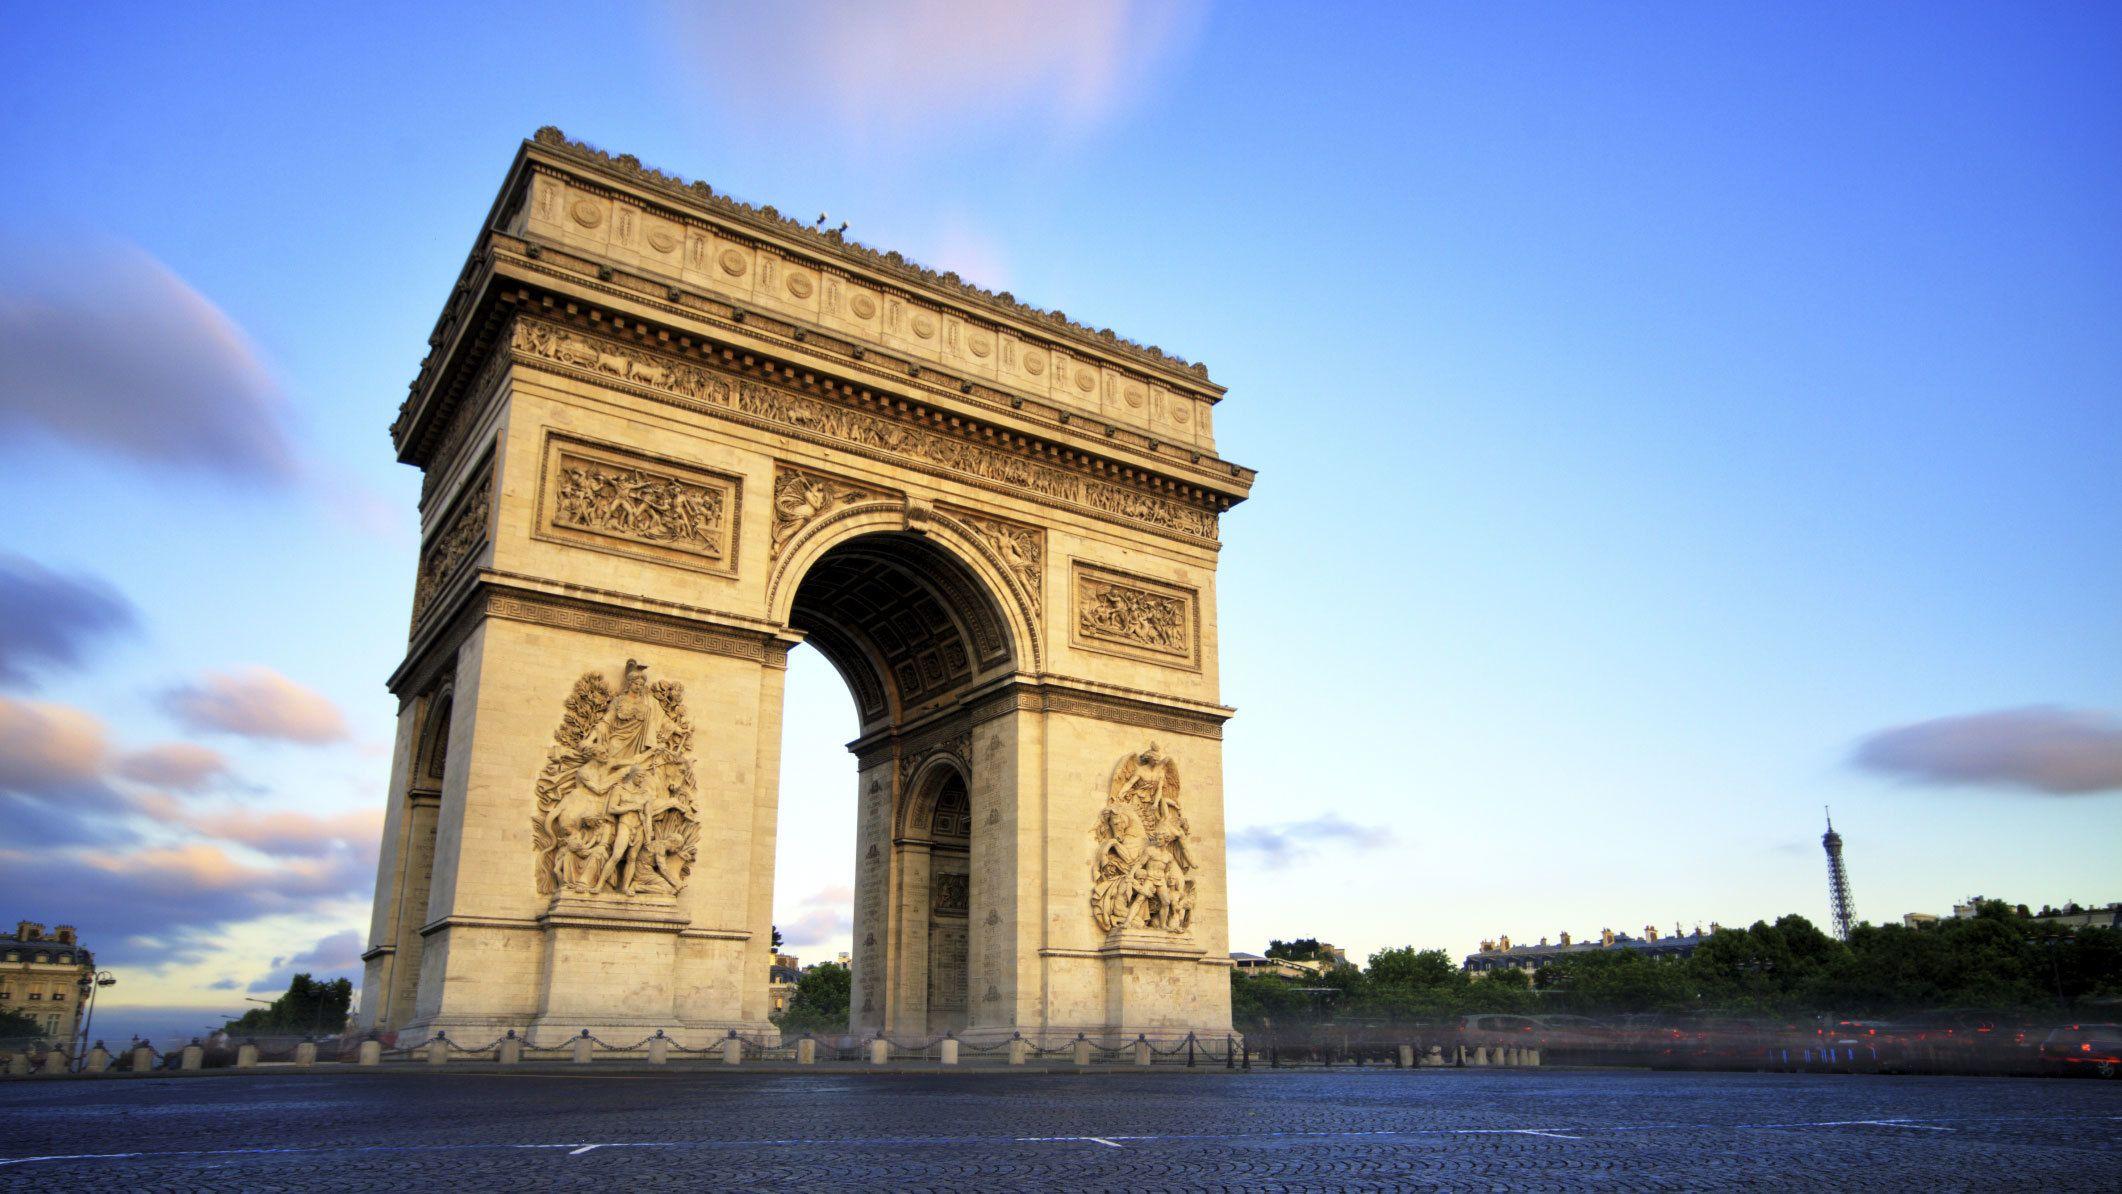 View of the Arc de Triomphe at dusk in Paris